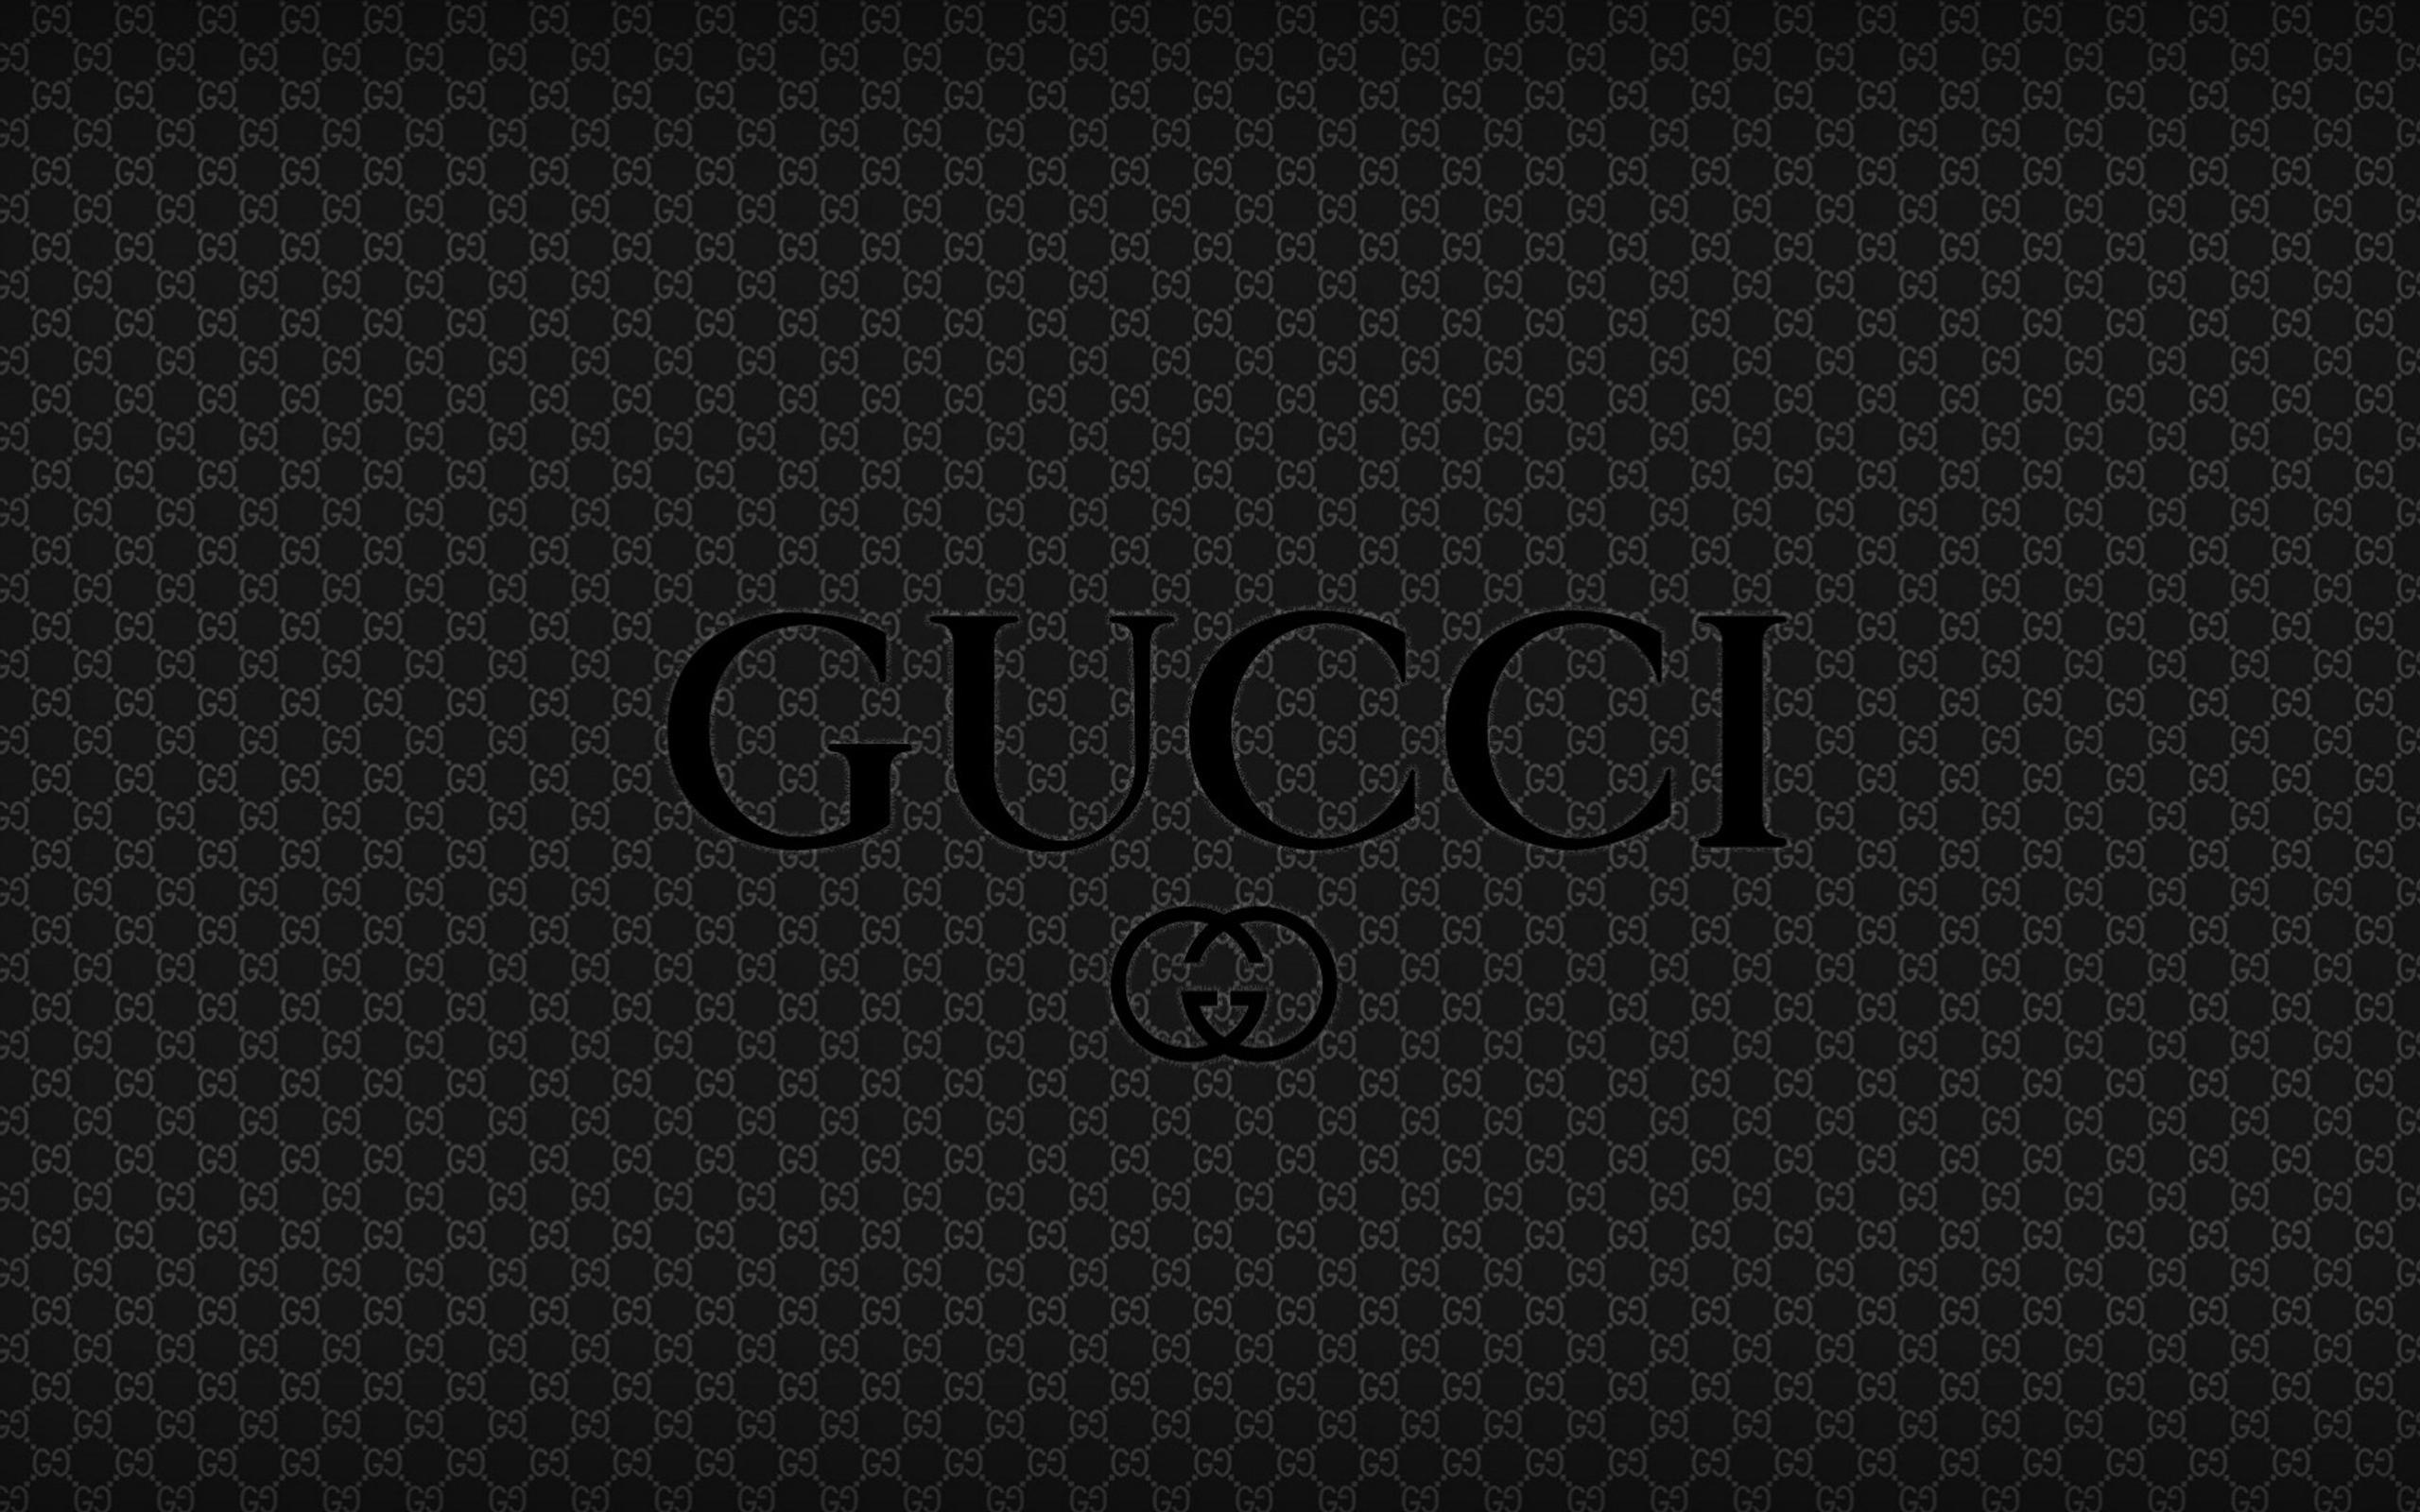 Luxury Brand Gucci Wallpaper